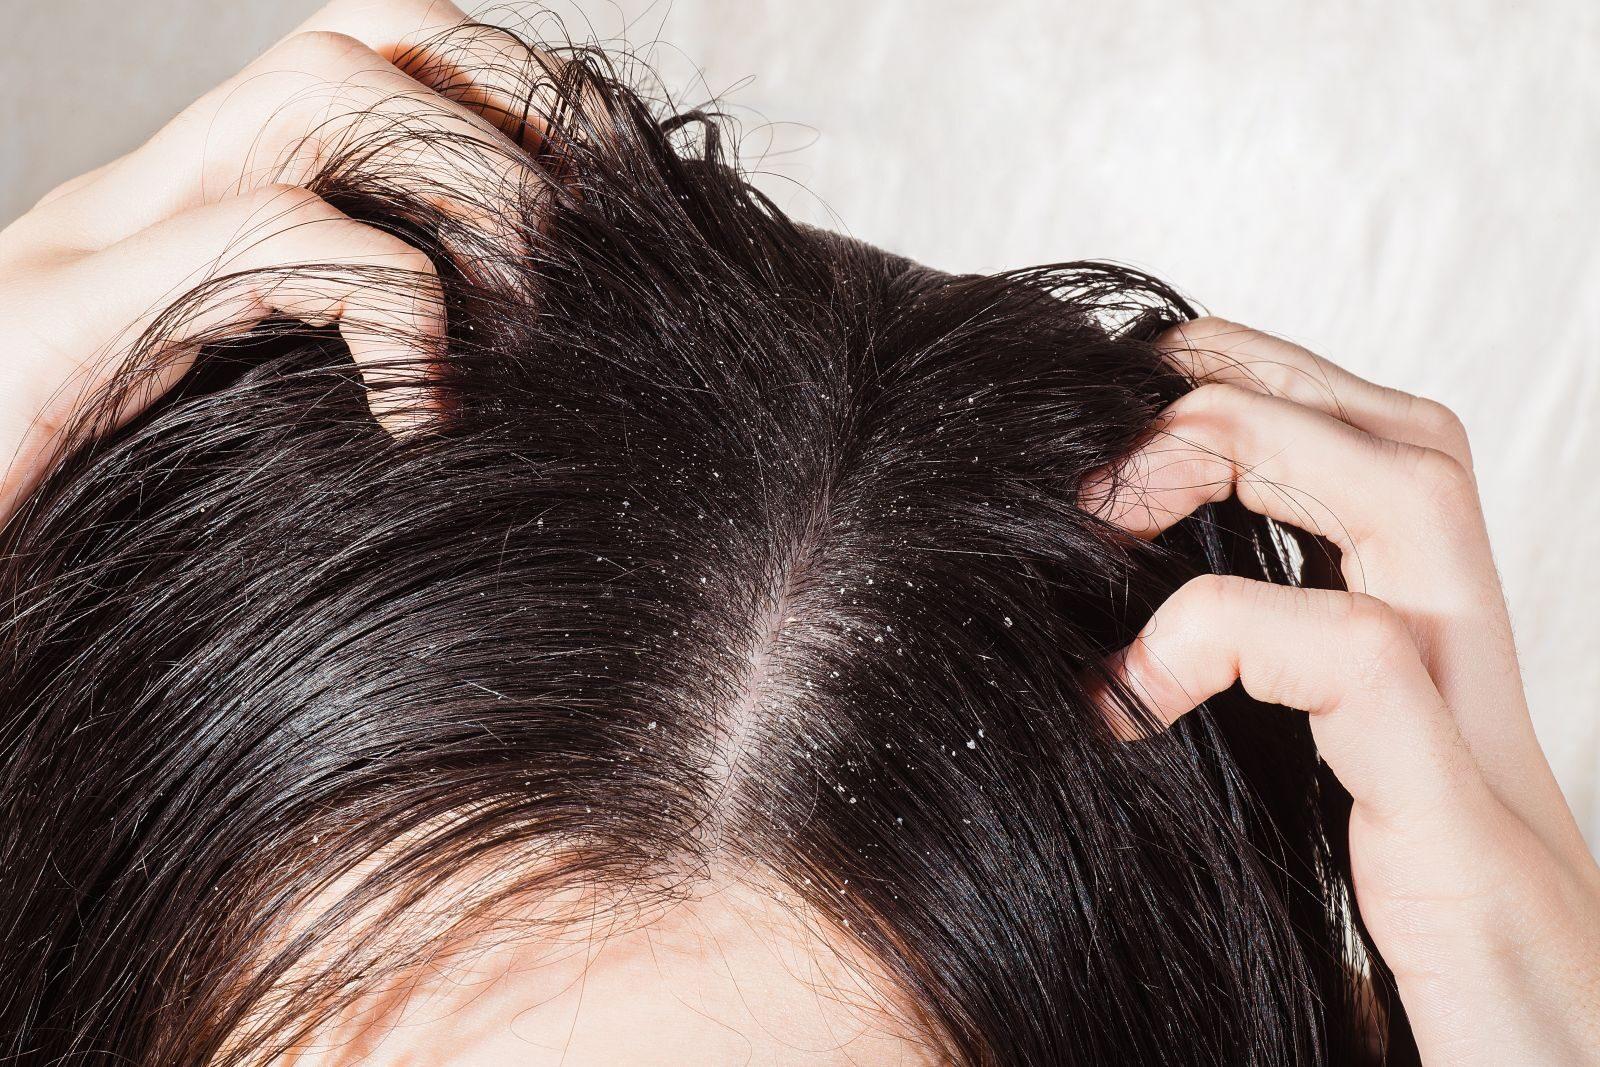 hogyan kell kezelni a haj pikkelysmr glicerin kezeli a pikkelysmr